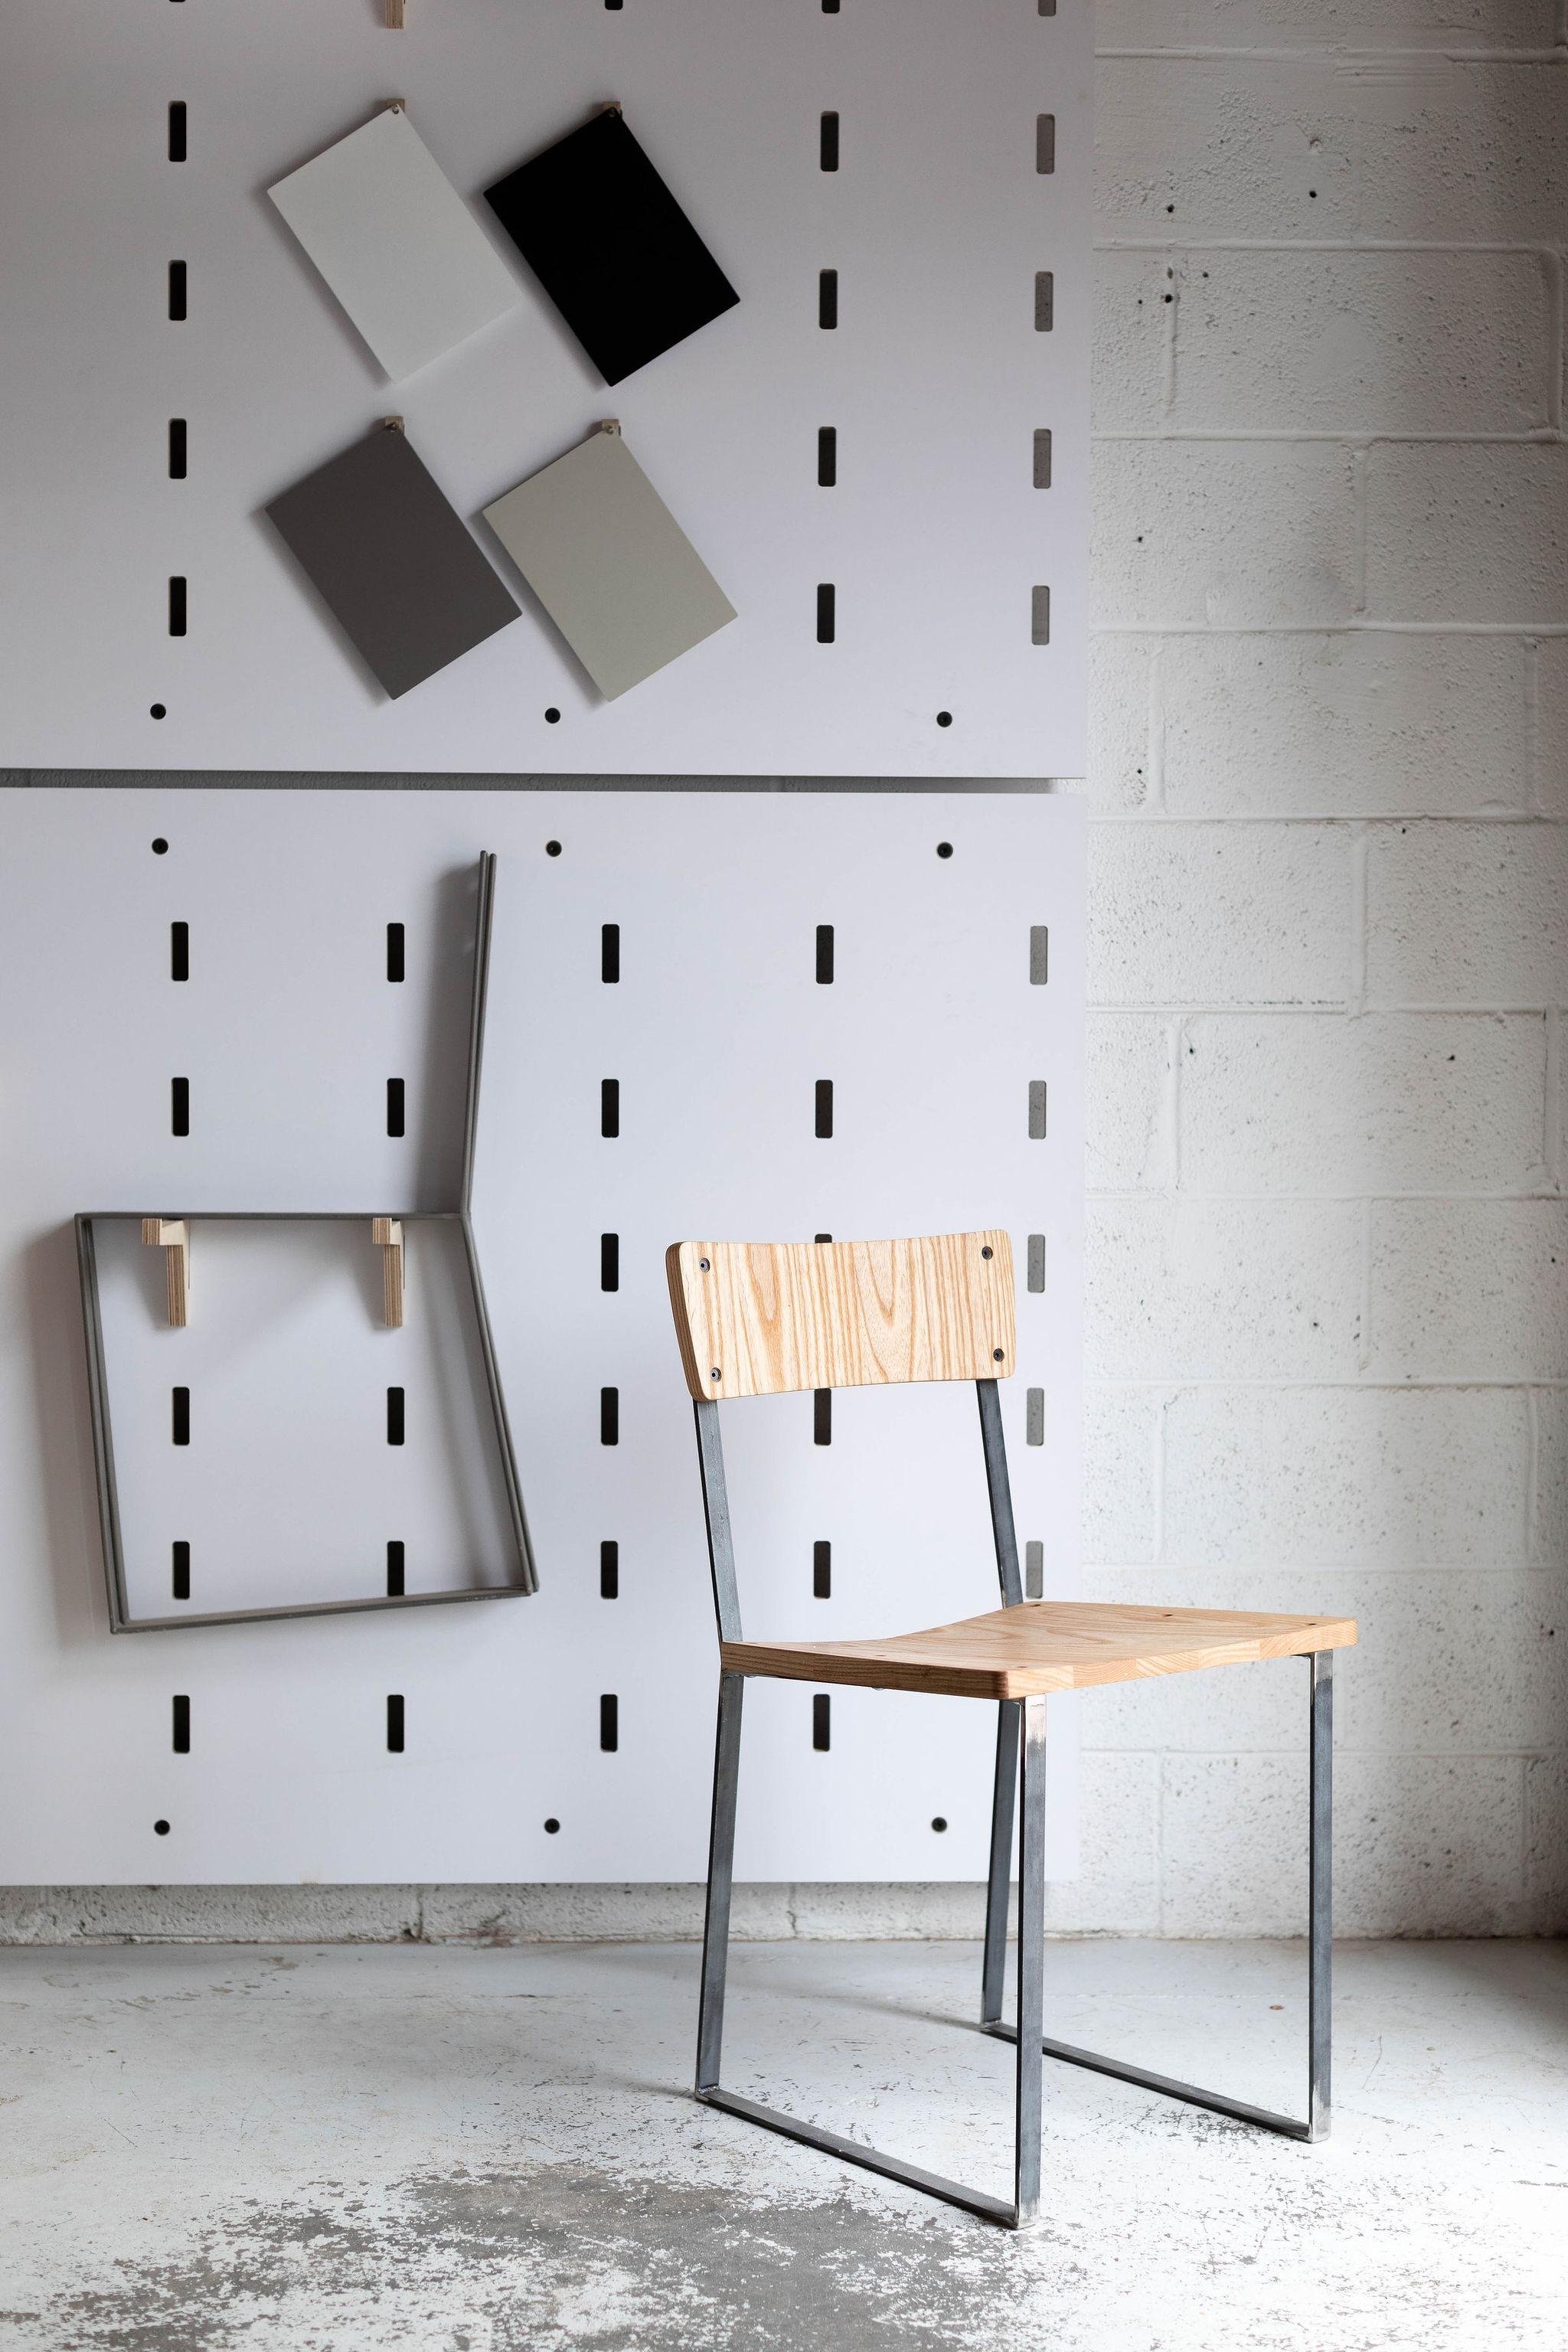 Jimena-Peck-2019Atla-Design-Boulder-by-Jimena-Peck-fopr-Lifestyle-Boulder-Magazine-IMG_2929.jpg